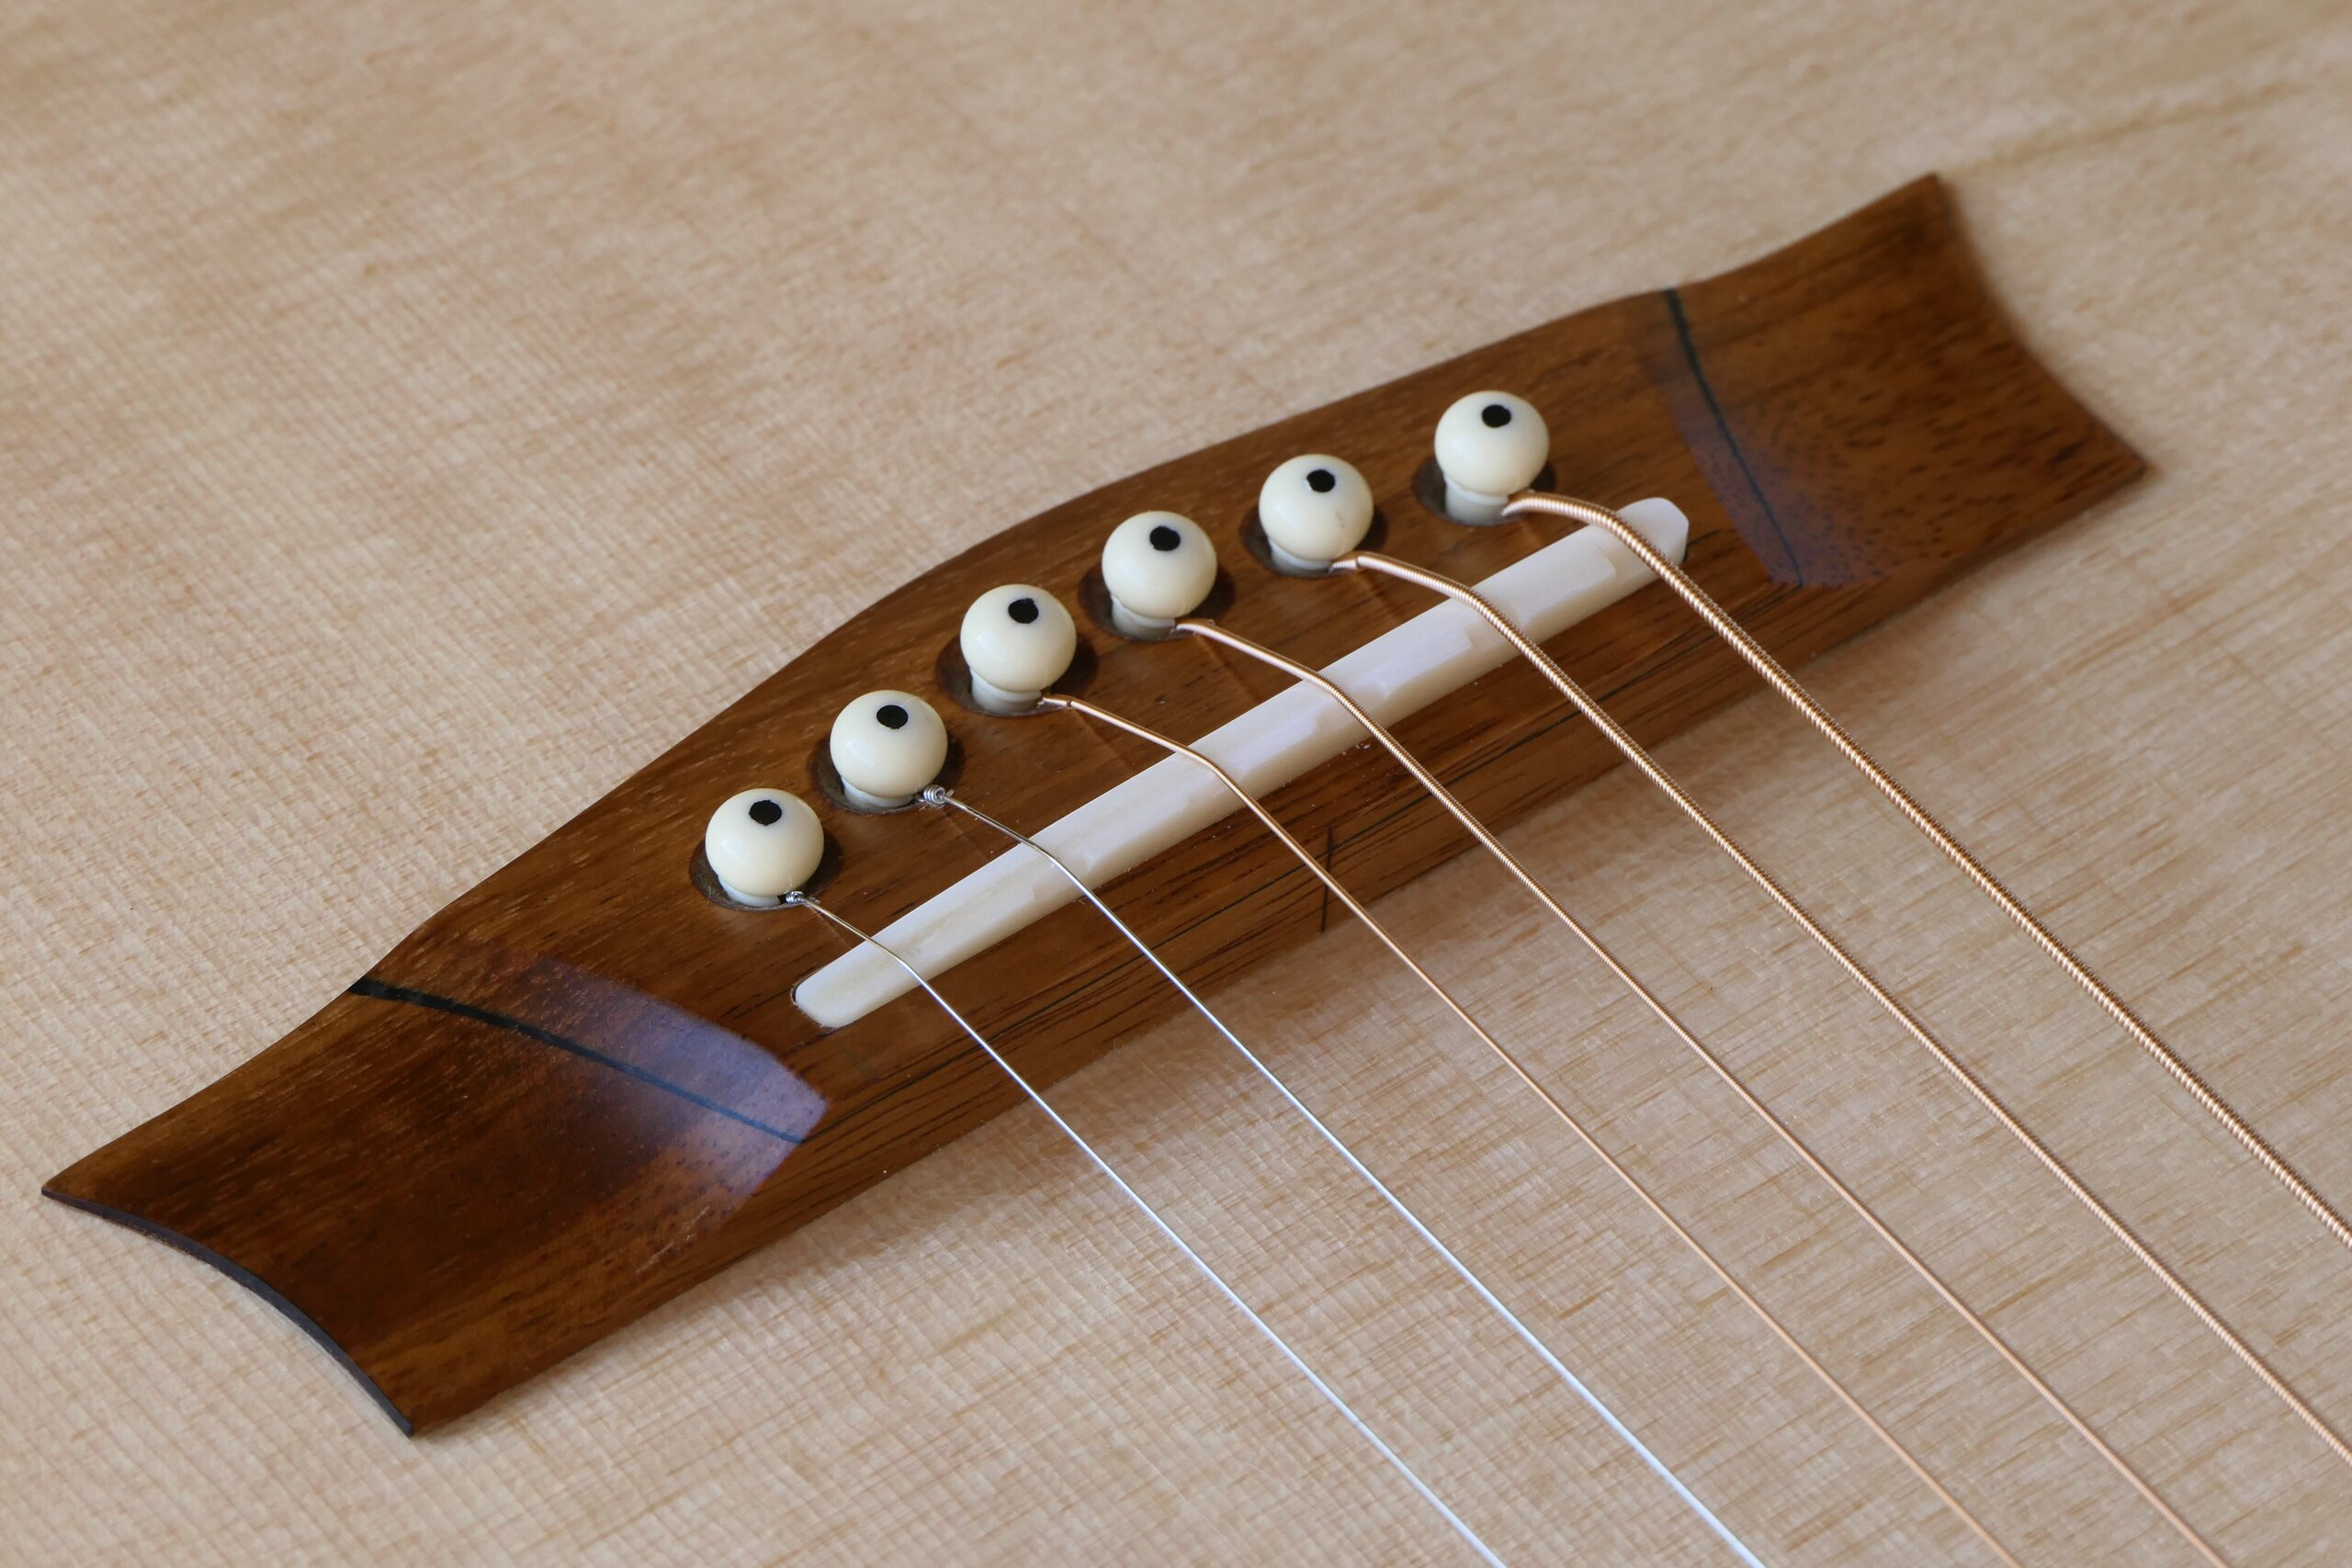 Steel string guitar bridge with Trevor Gore compensation on the saddle